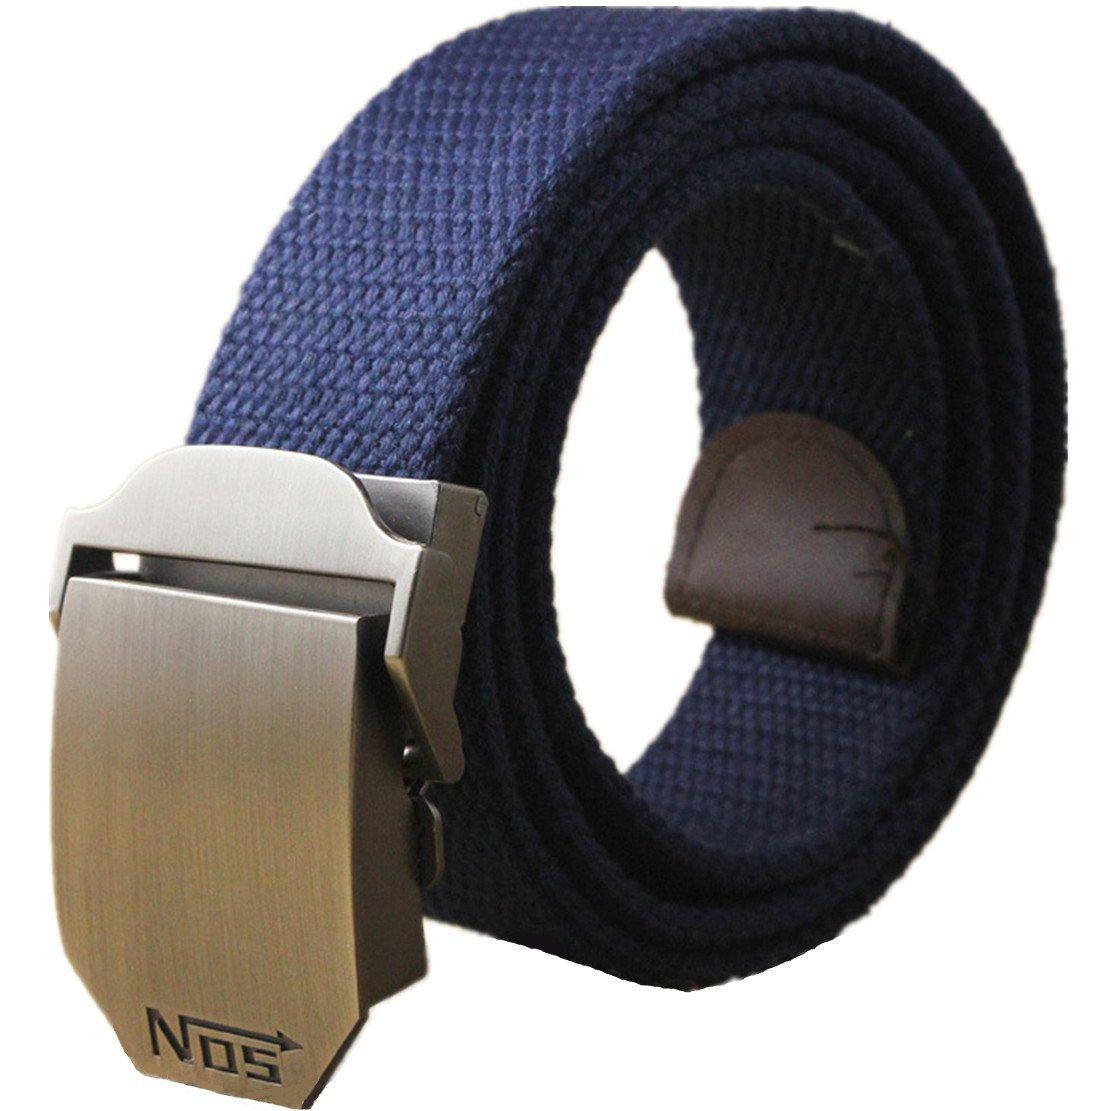 Winter Spark Belts Nylon Letter Design Metal Buckle Webbing Durable Thicken Canvas Men Belt (Navy Blue)